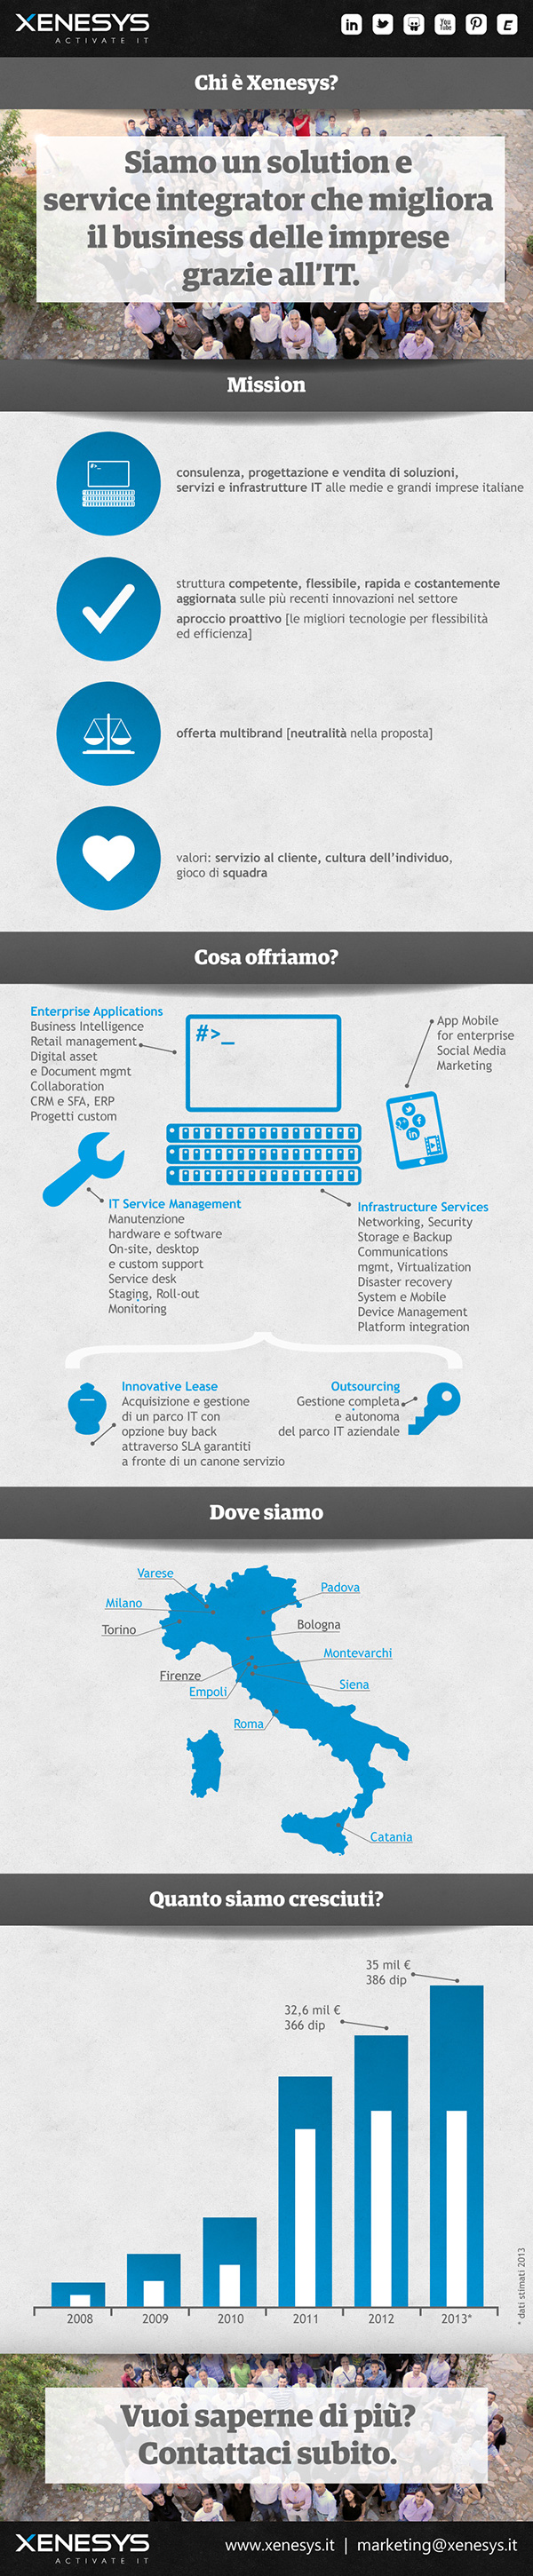 commercial Business Proposal marketing   infographic Infrastructure Services IT Service Management Enterprise Applications